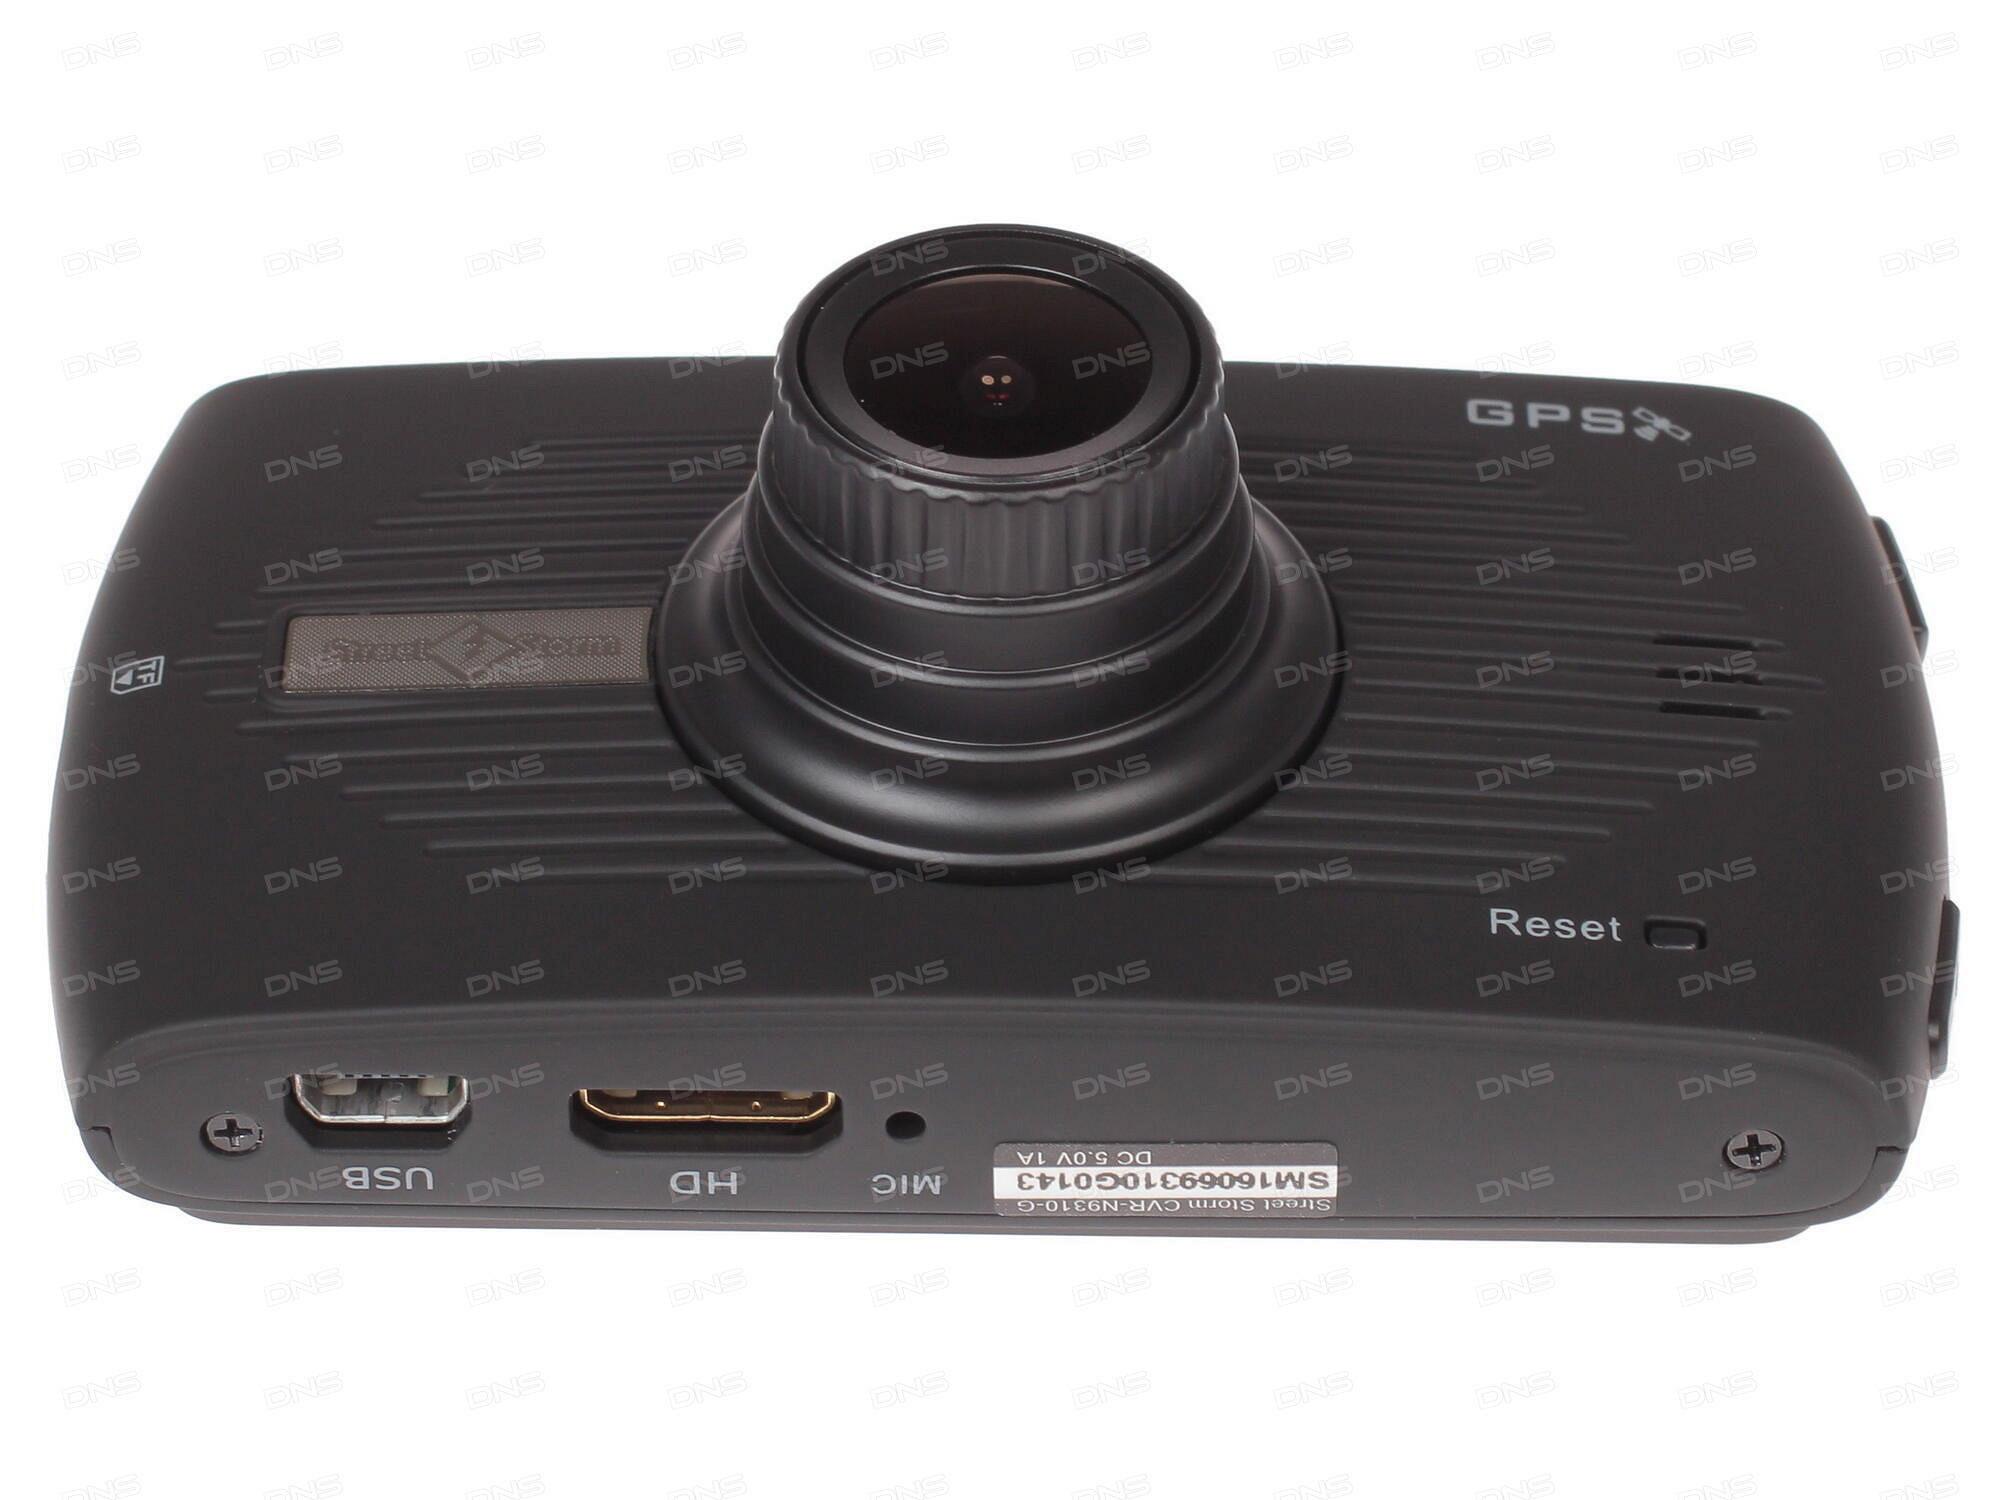 cpd 505 cpcam инструкция